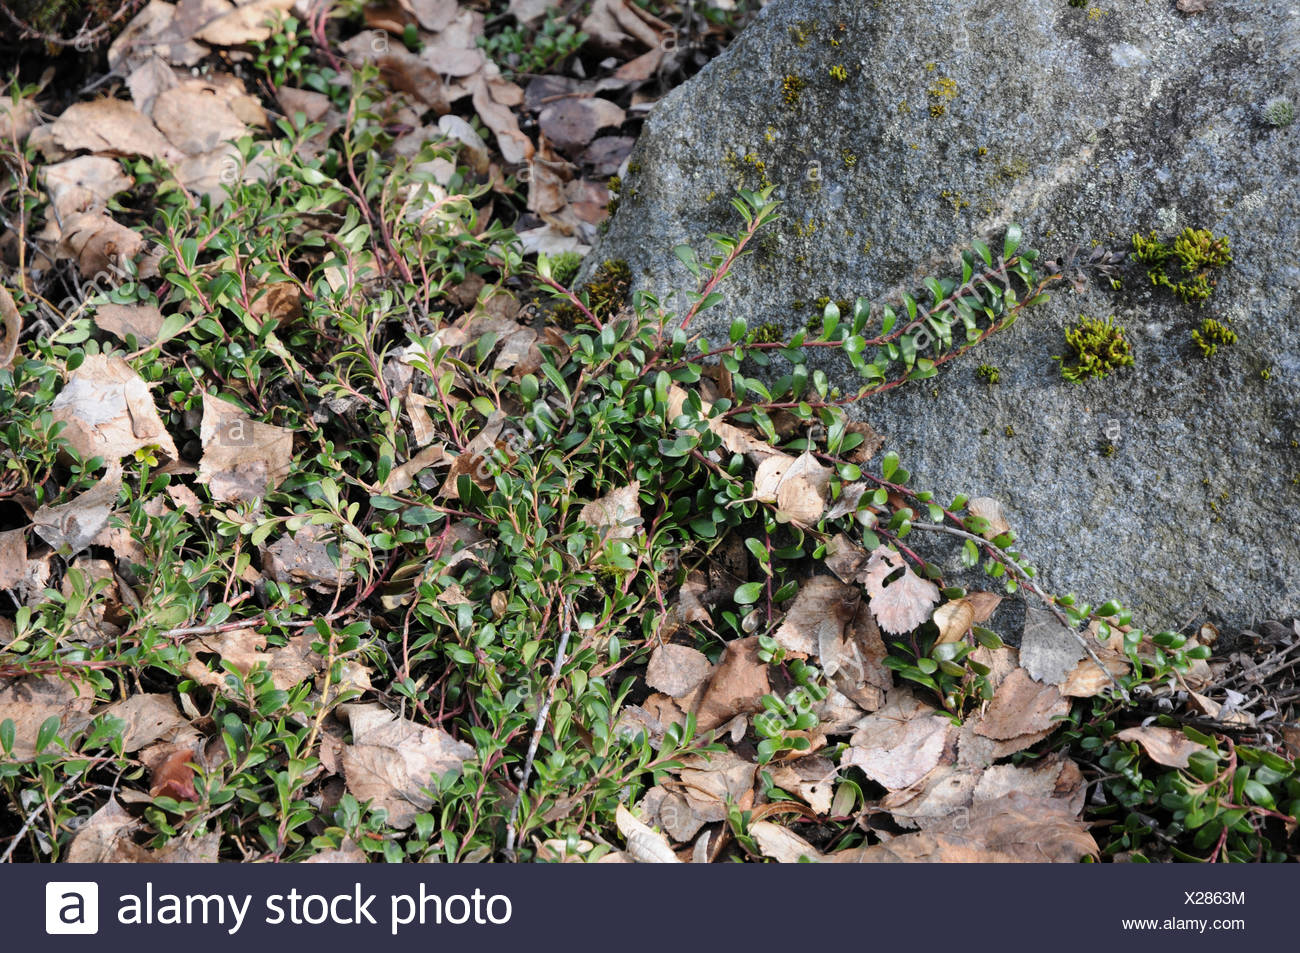 Arctostaphylos uva-ursi, Bearberry - Stock Image